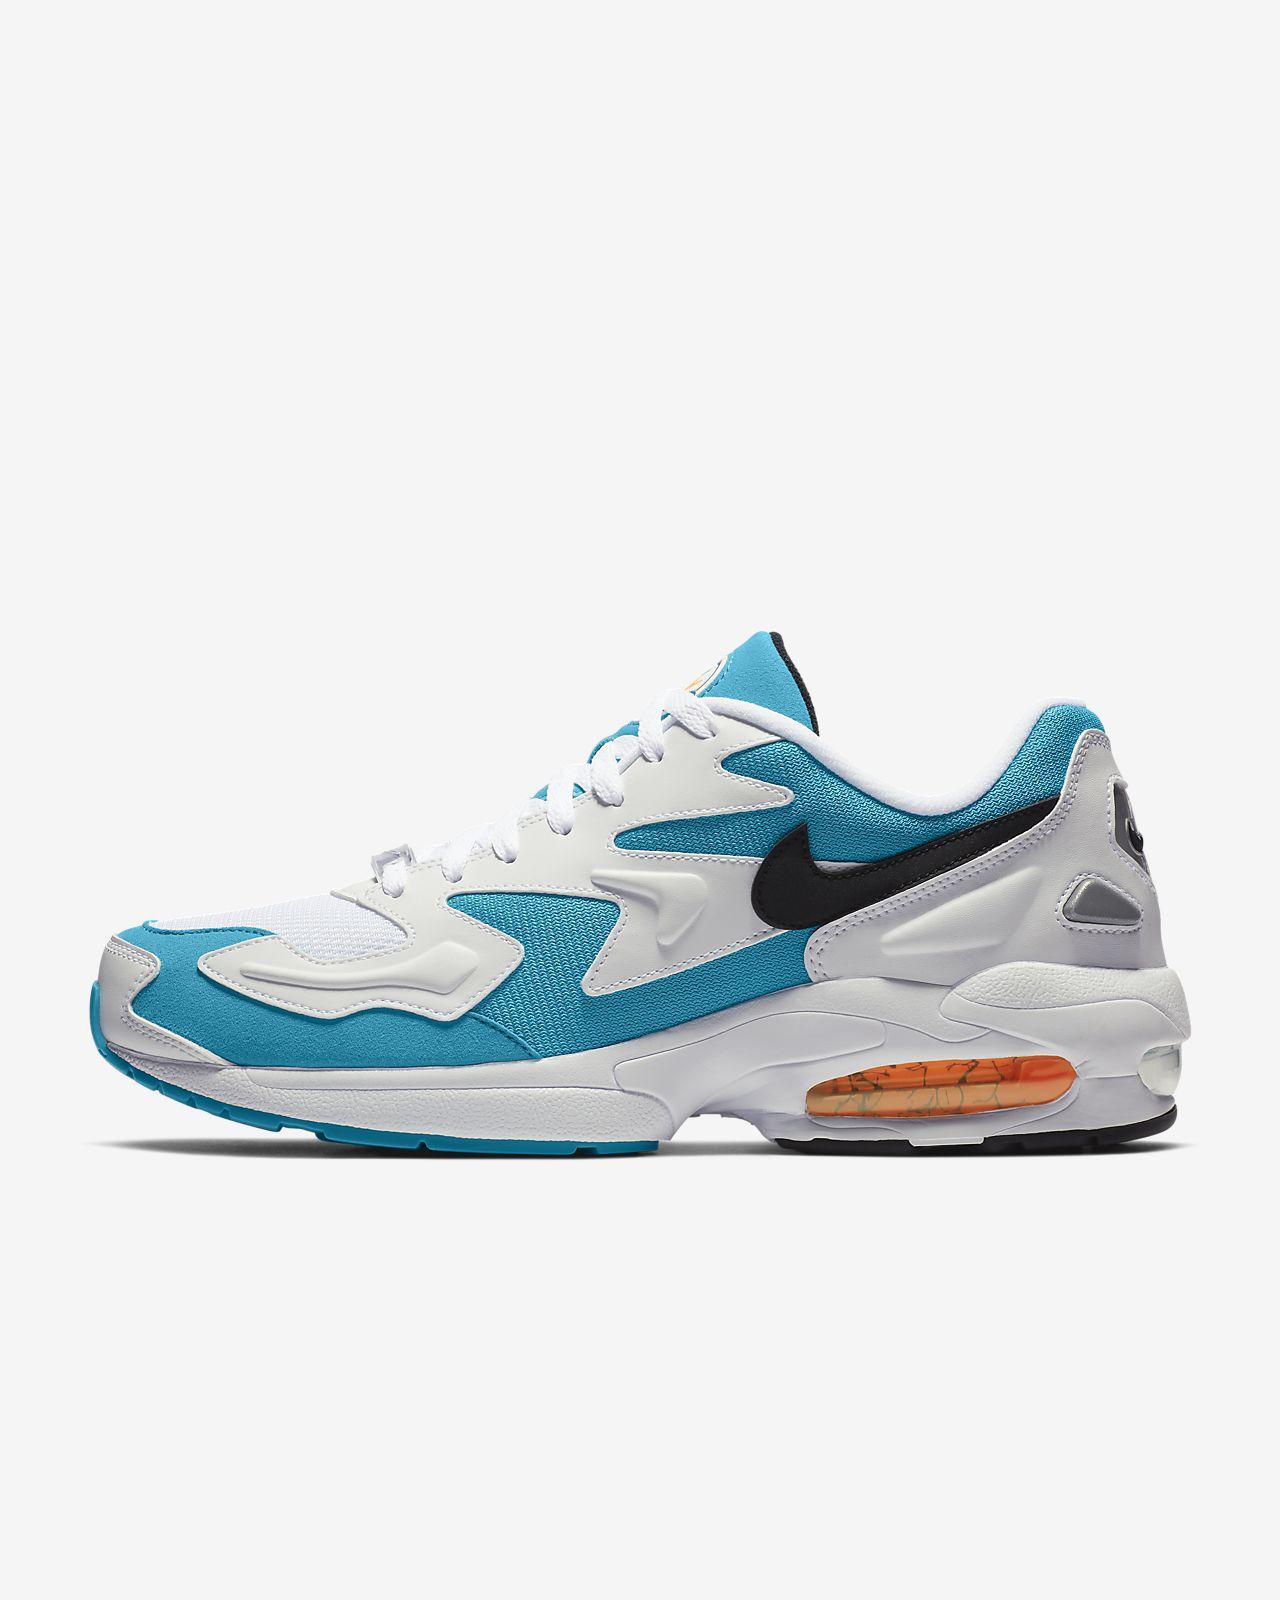 1467654a79 Nike Air Max2 Light Men's Shoe. Nike.com IN